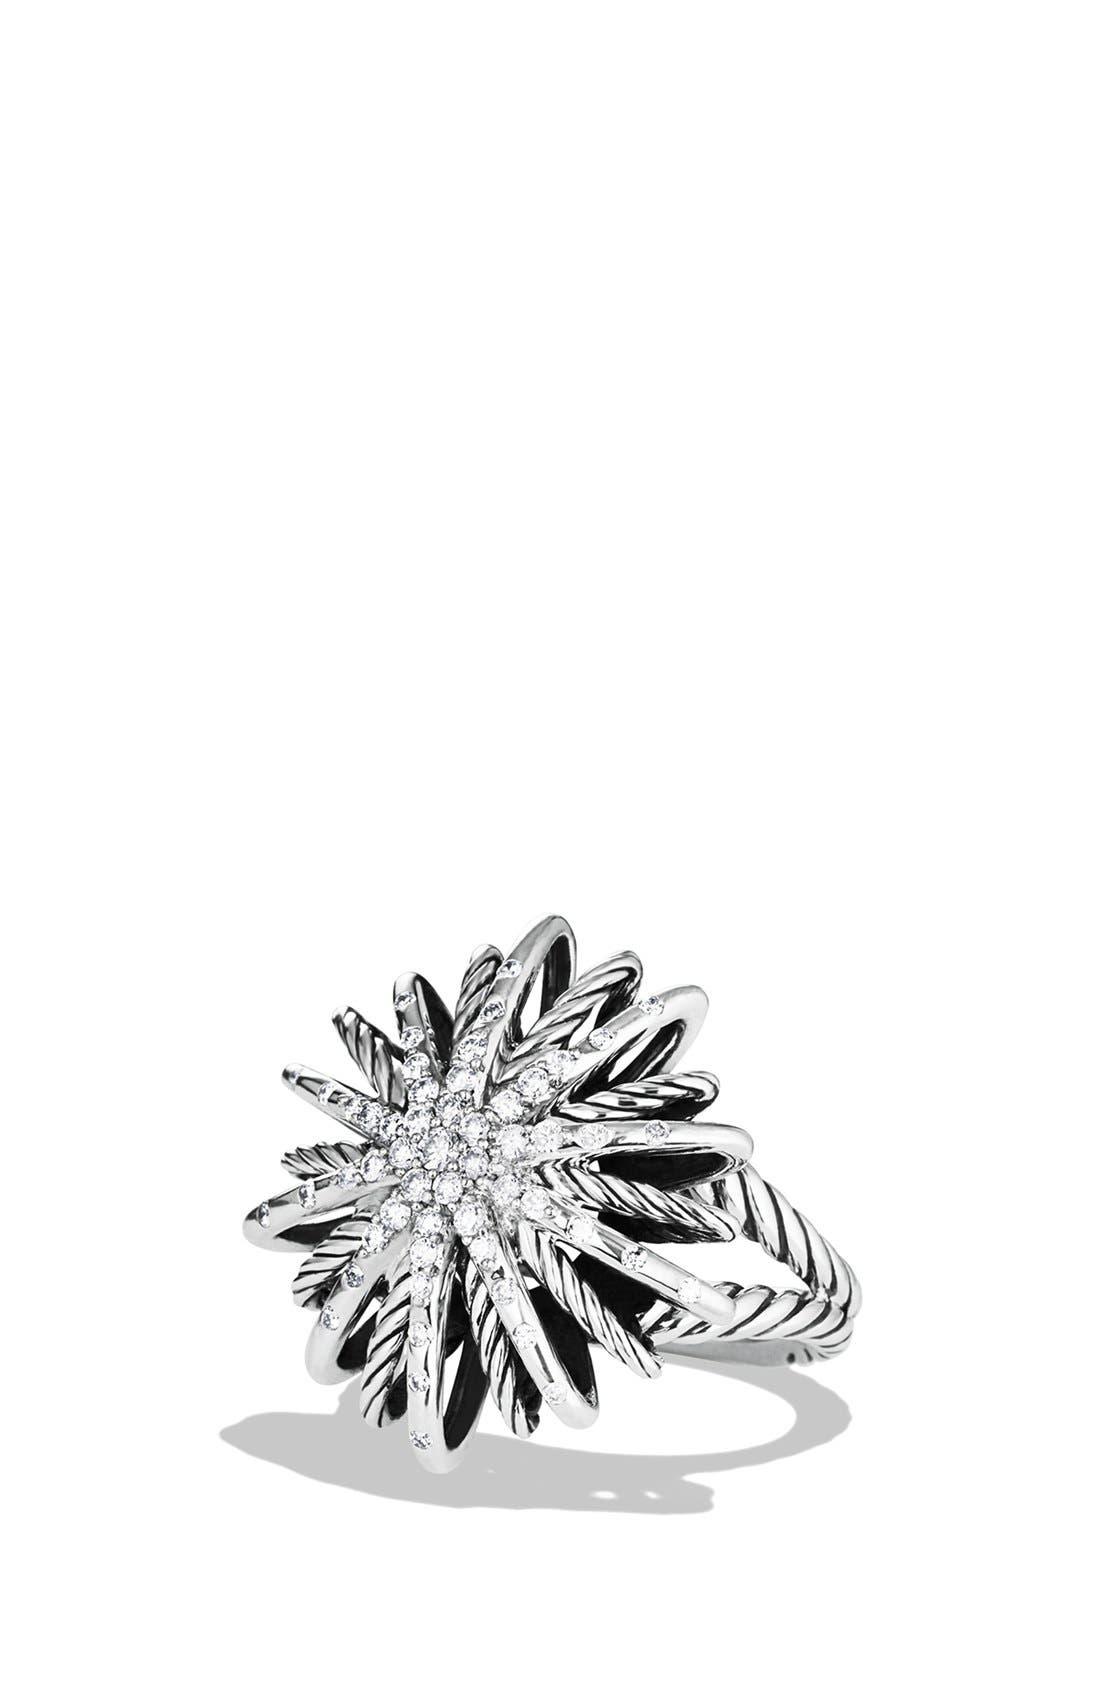 Main Image - David Yurman 'Starburst' Ring with Diamonds